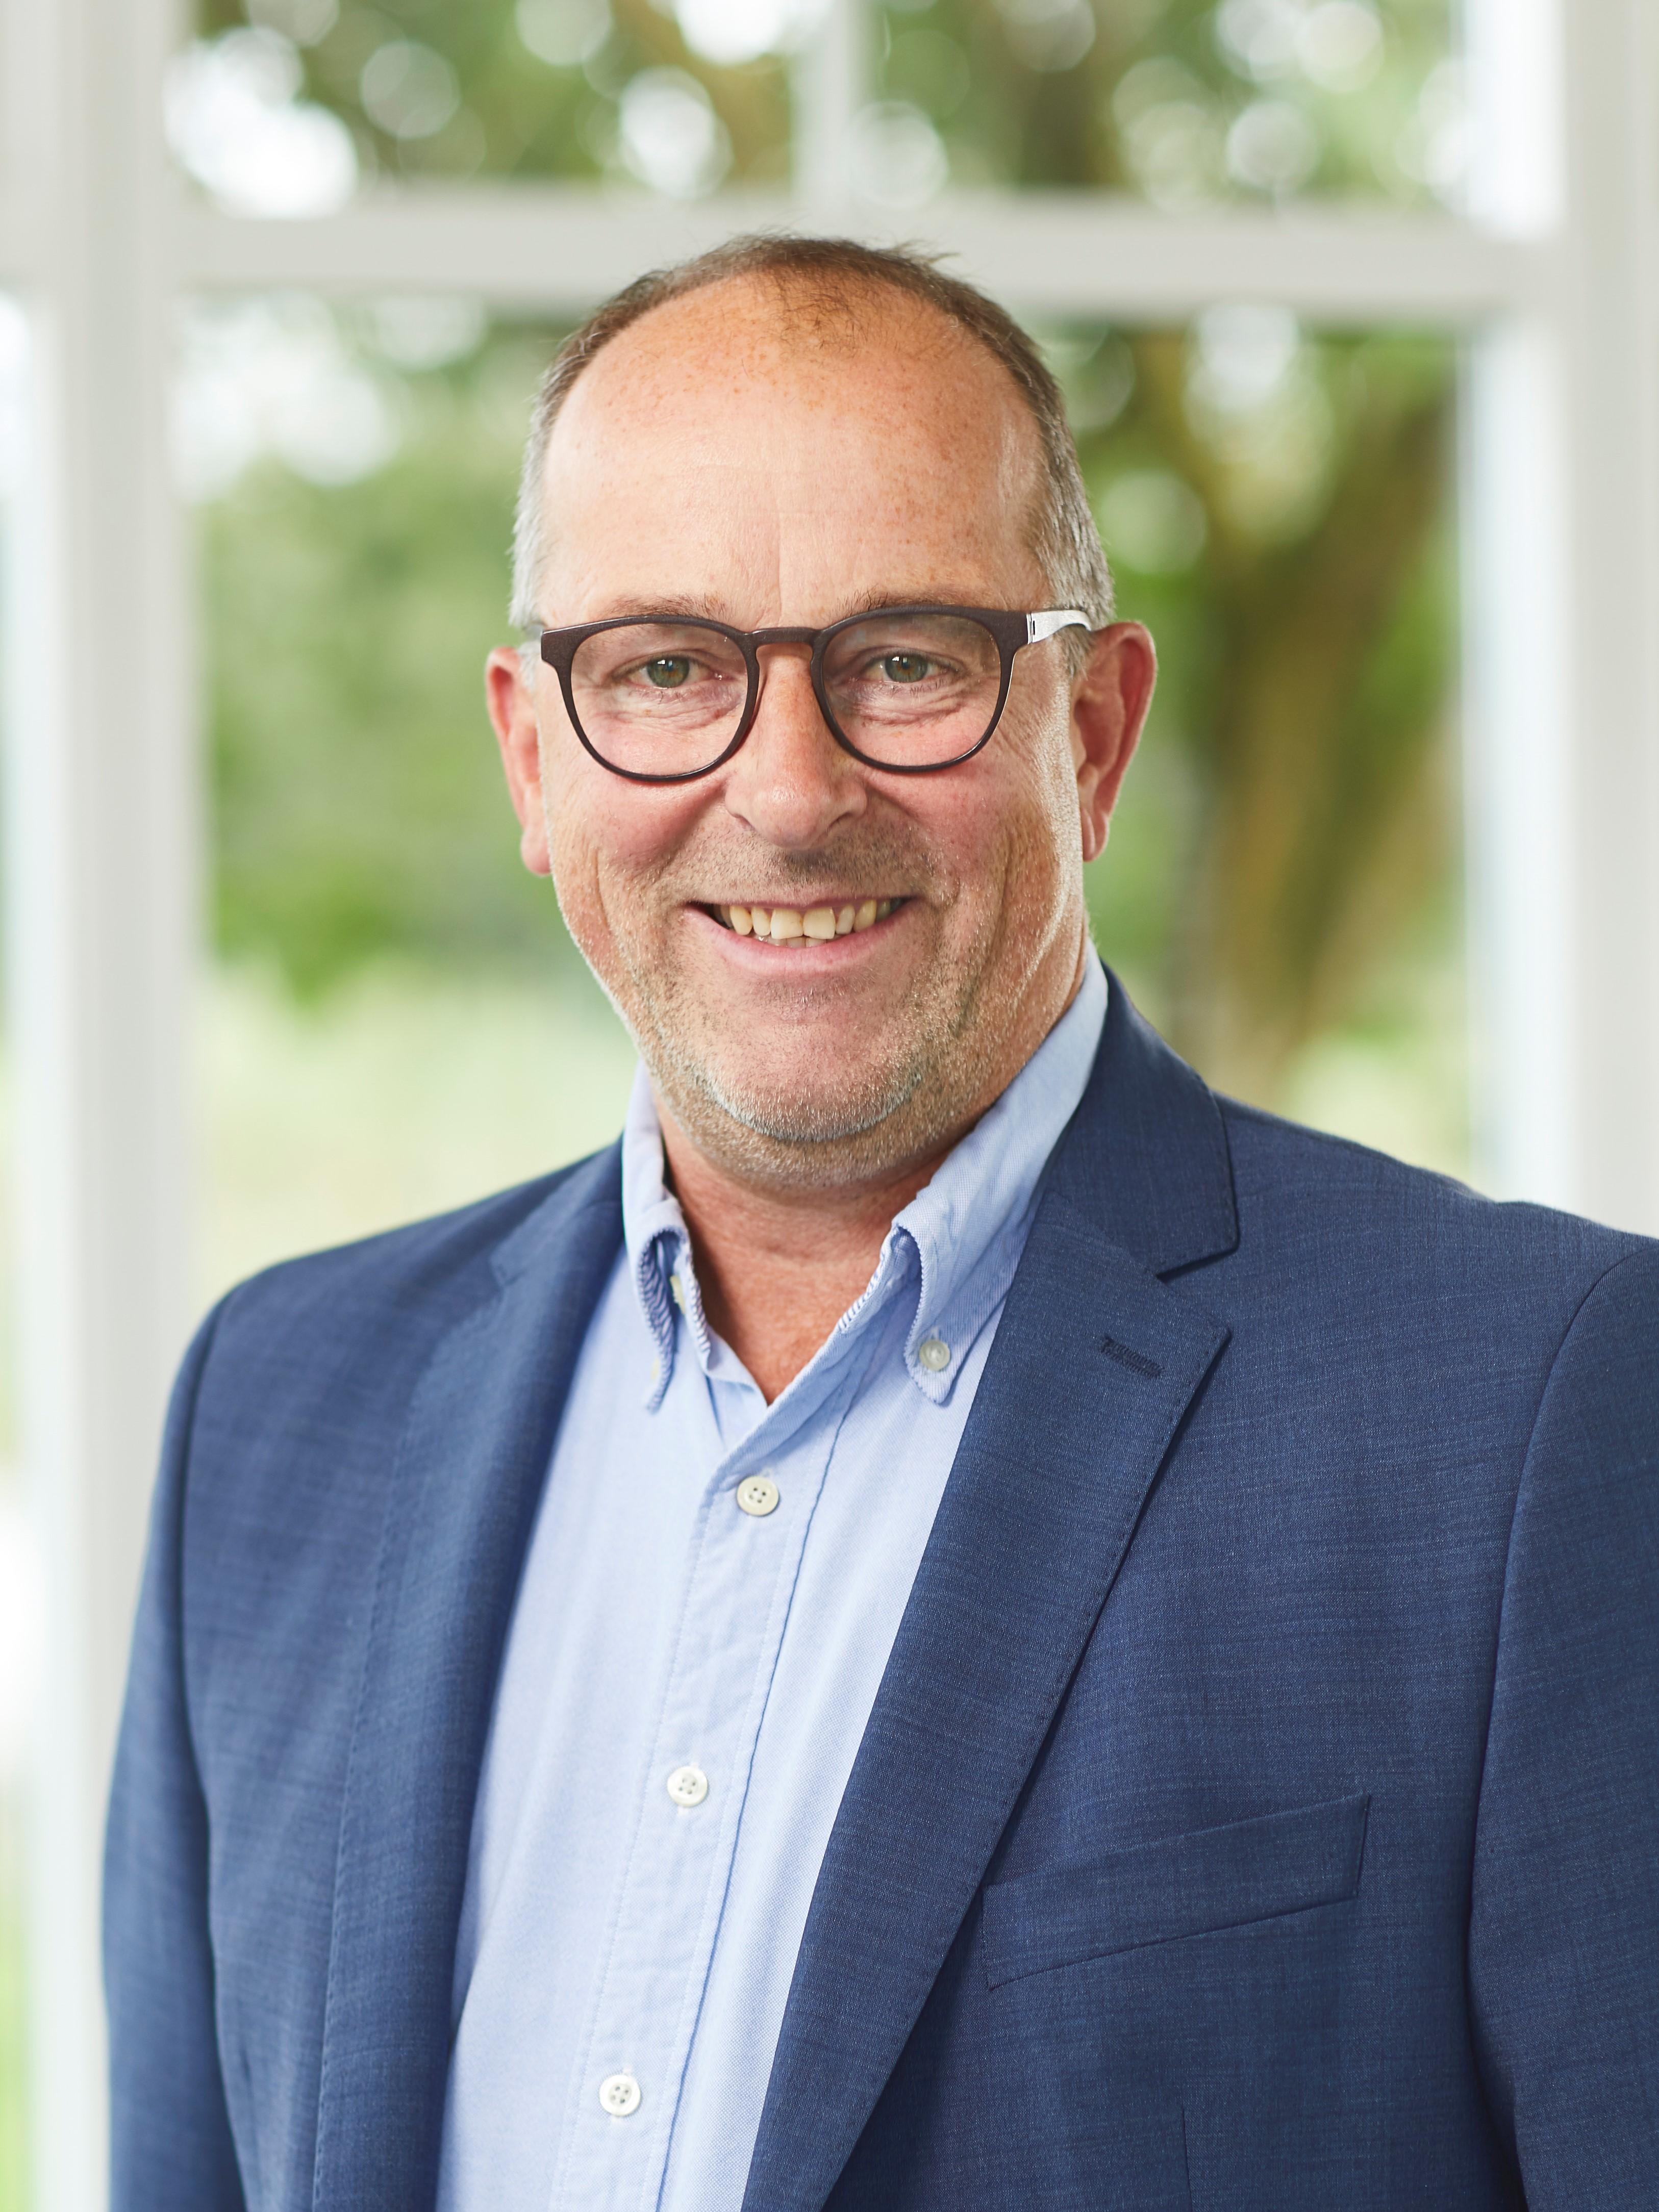 Jens Legarth